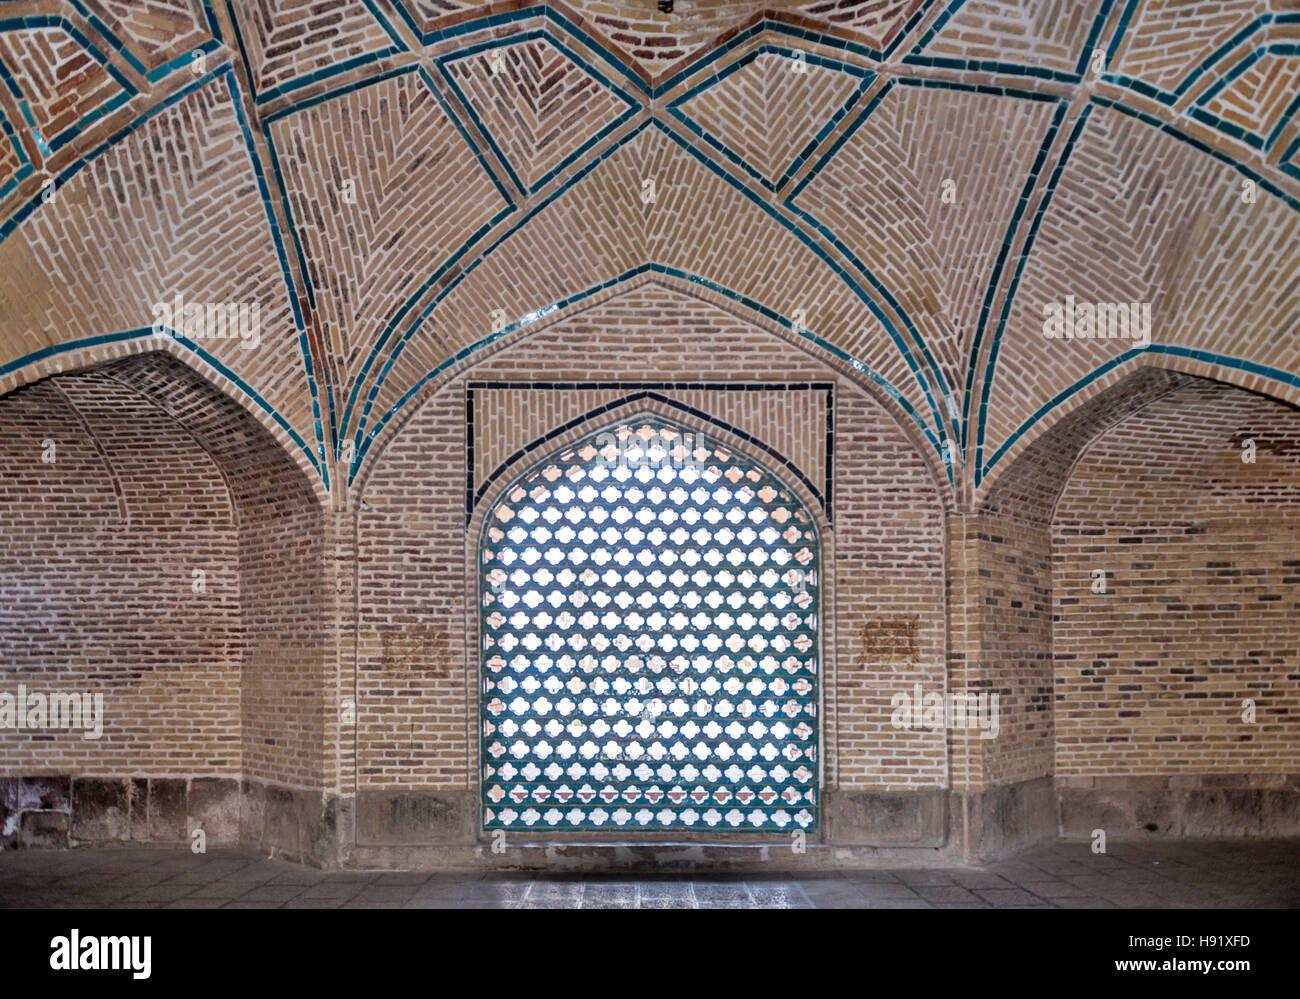 Mascidi Cuma Friday Mosque Kezvin Iran - Stock Image